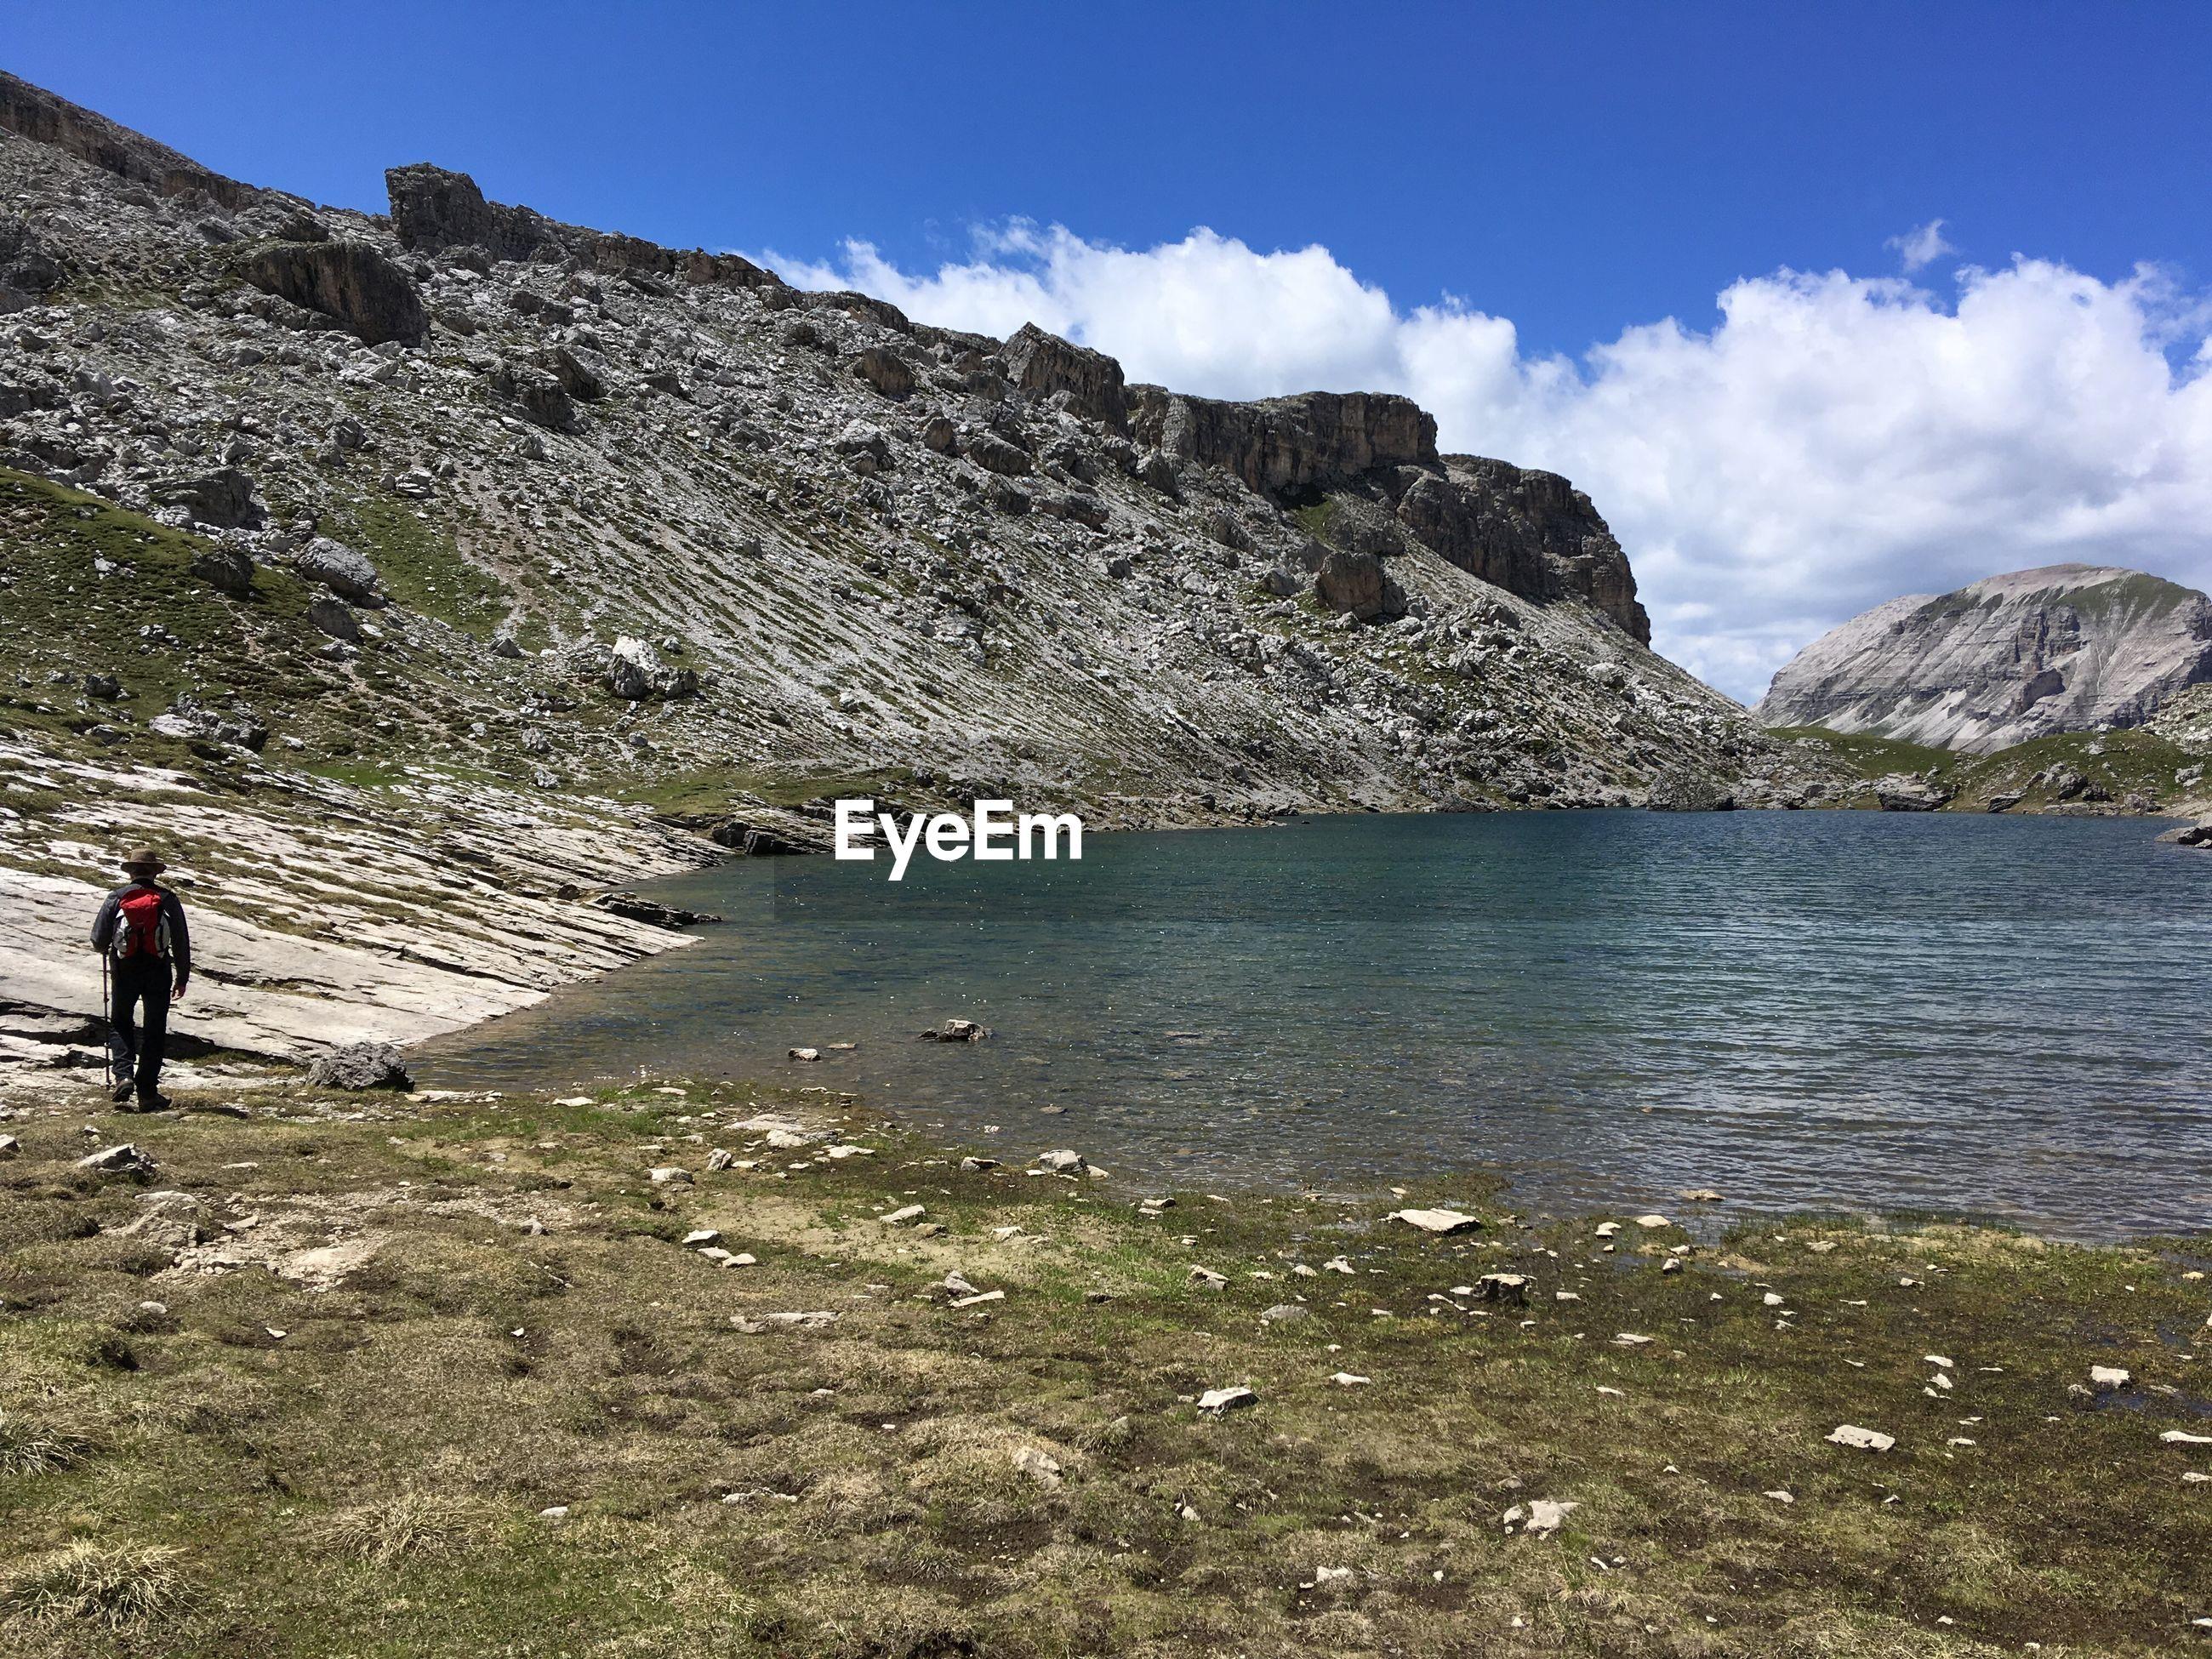 rocks by lake against sky in the dolomites, near passo gardena